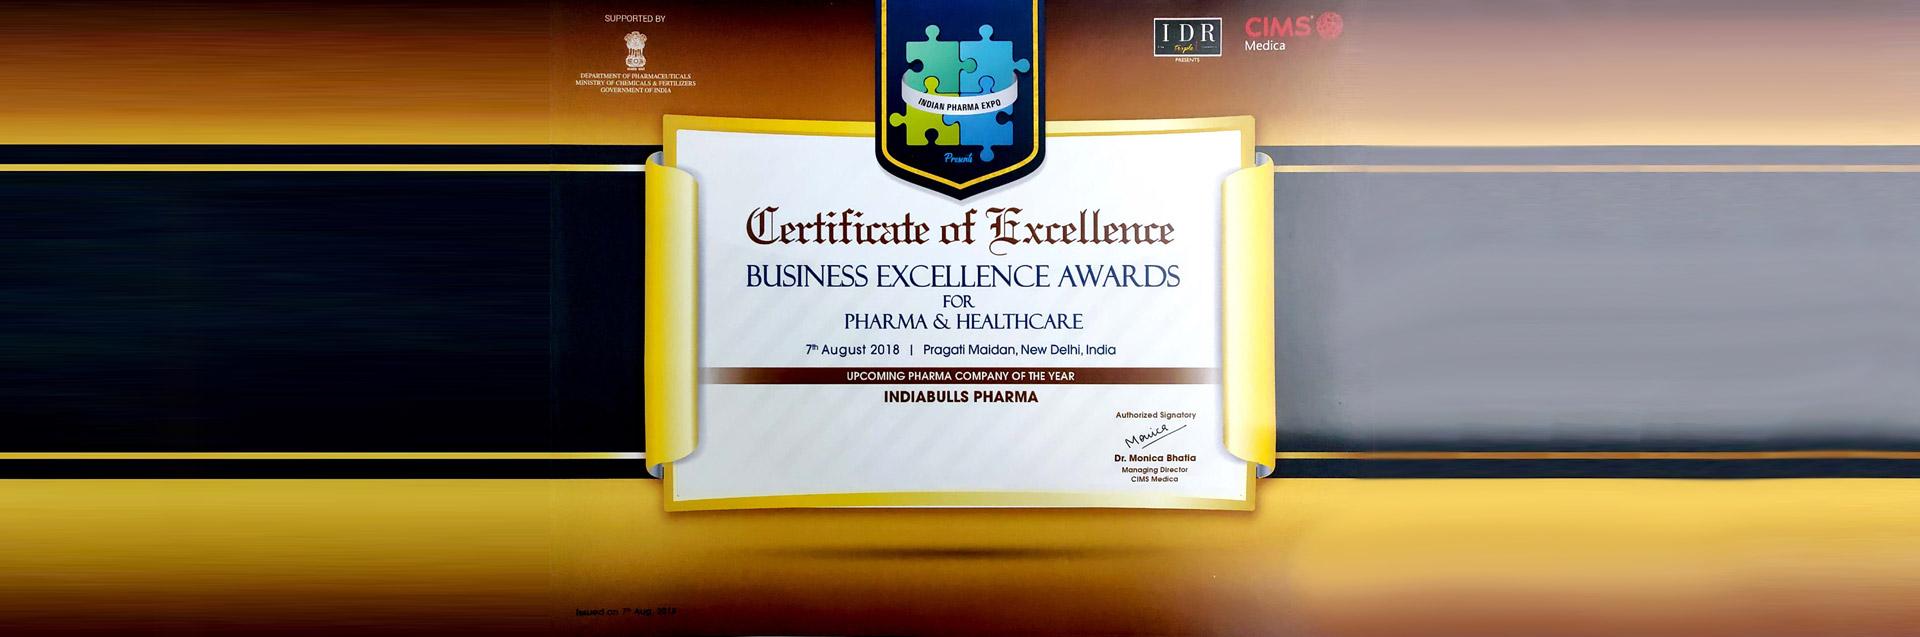 Leading Pharmaceutical Company In India | Indiabulls